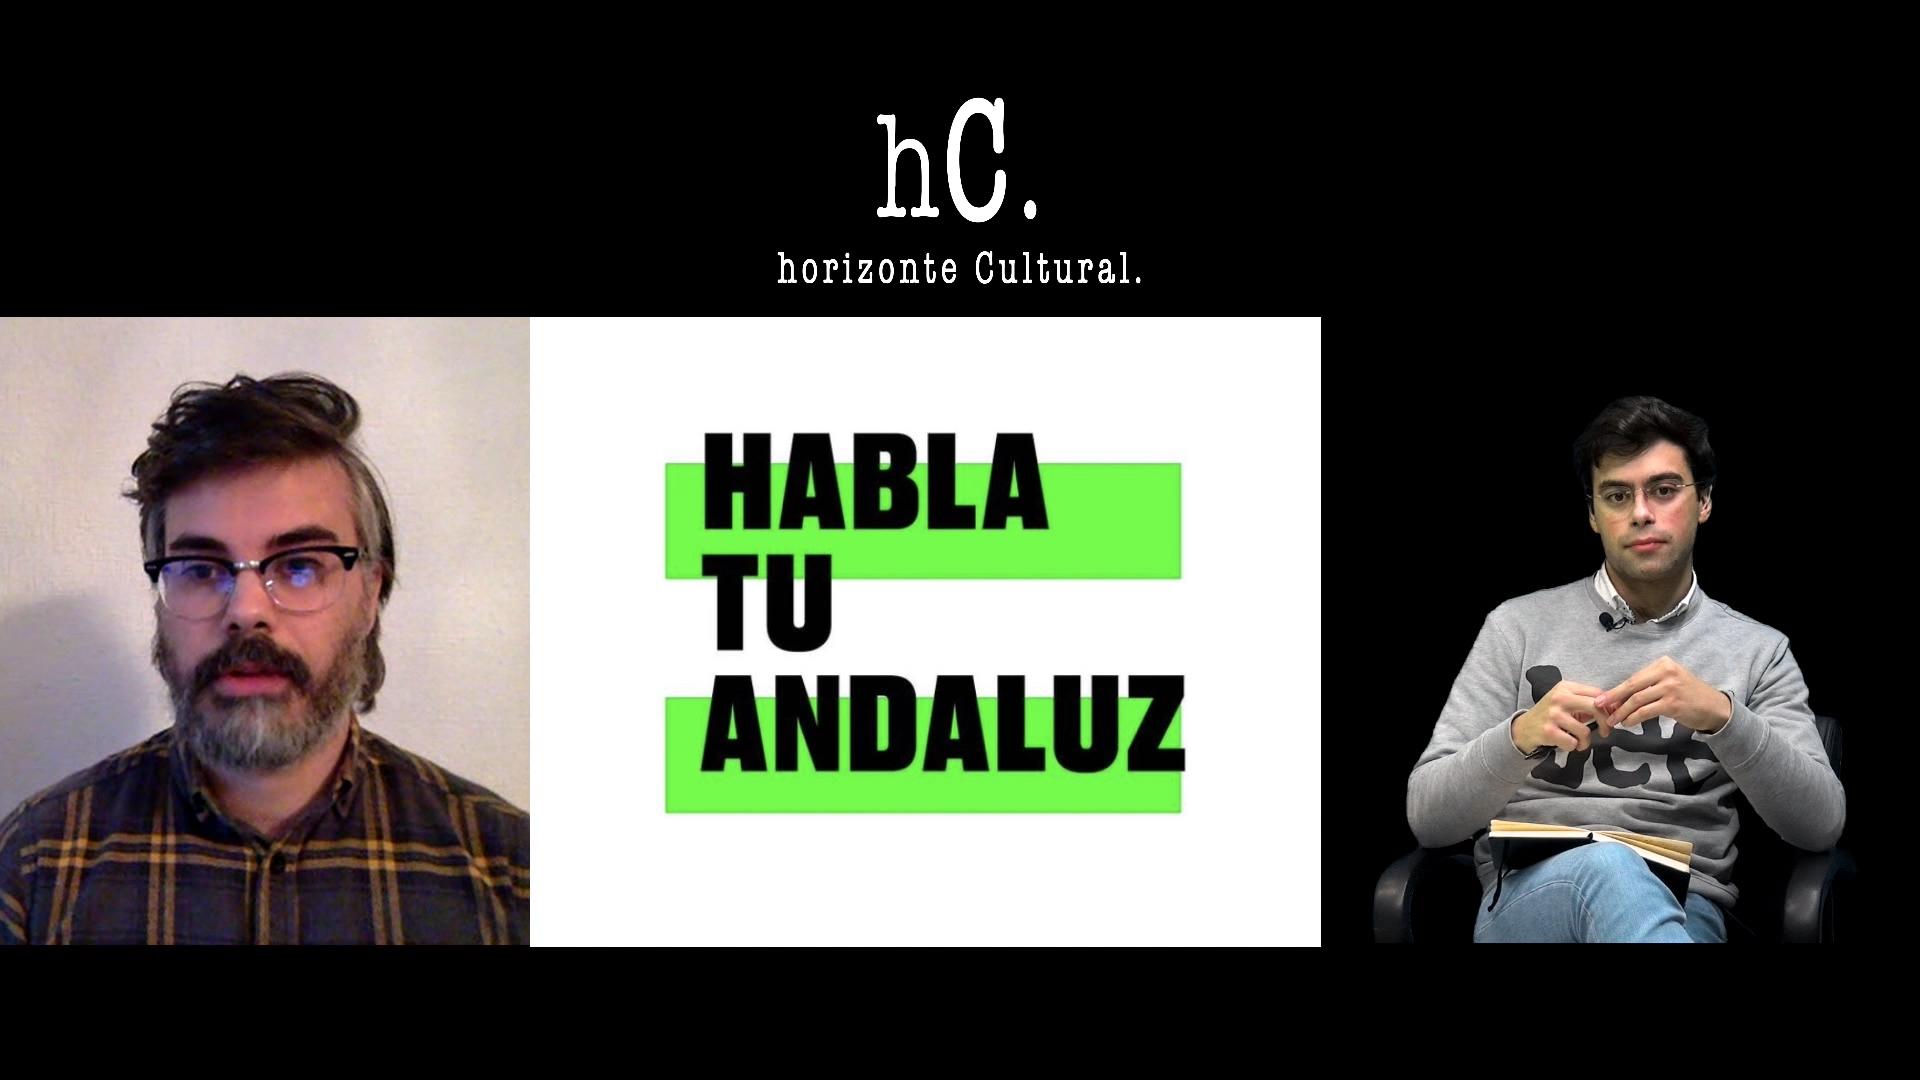 Horizonte Cultural Habla Andaluz 2021